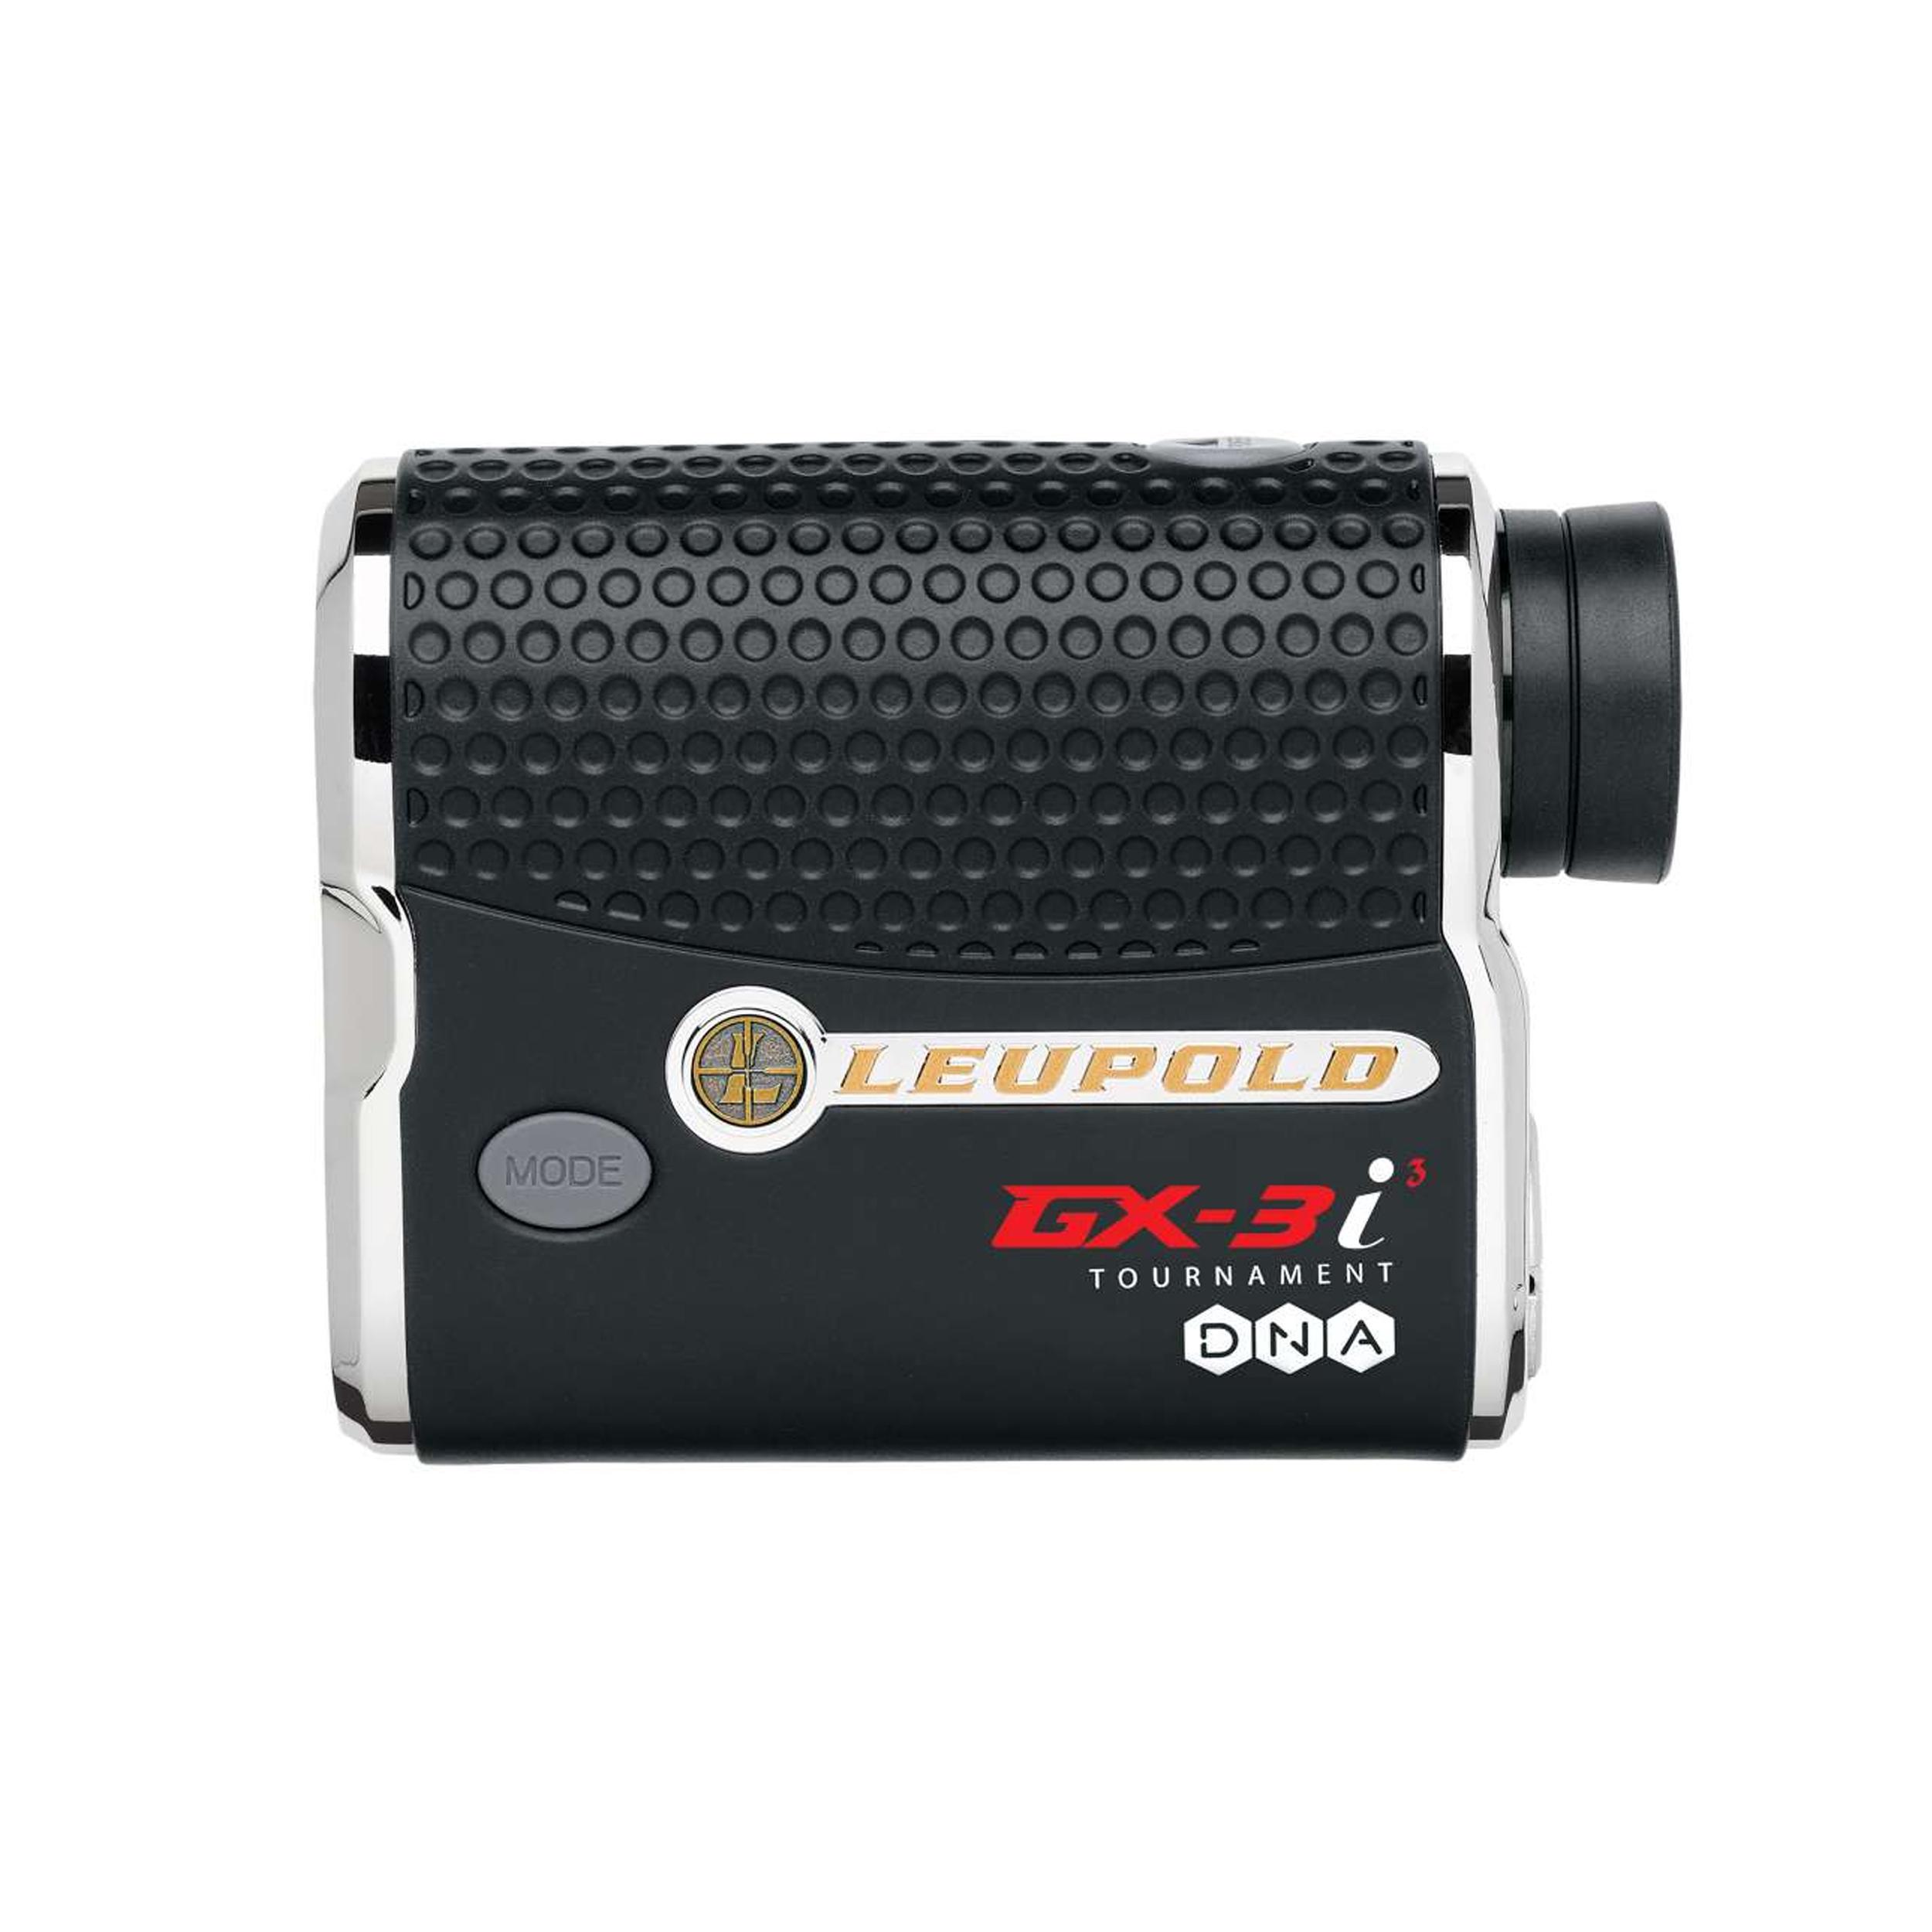 Leupold Golf GX-3i3 Digital Golf Rangefinder, Handheld Monoc